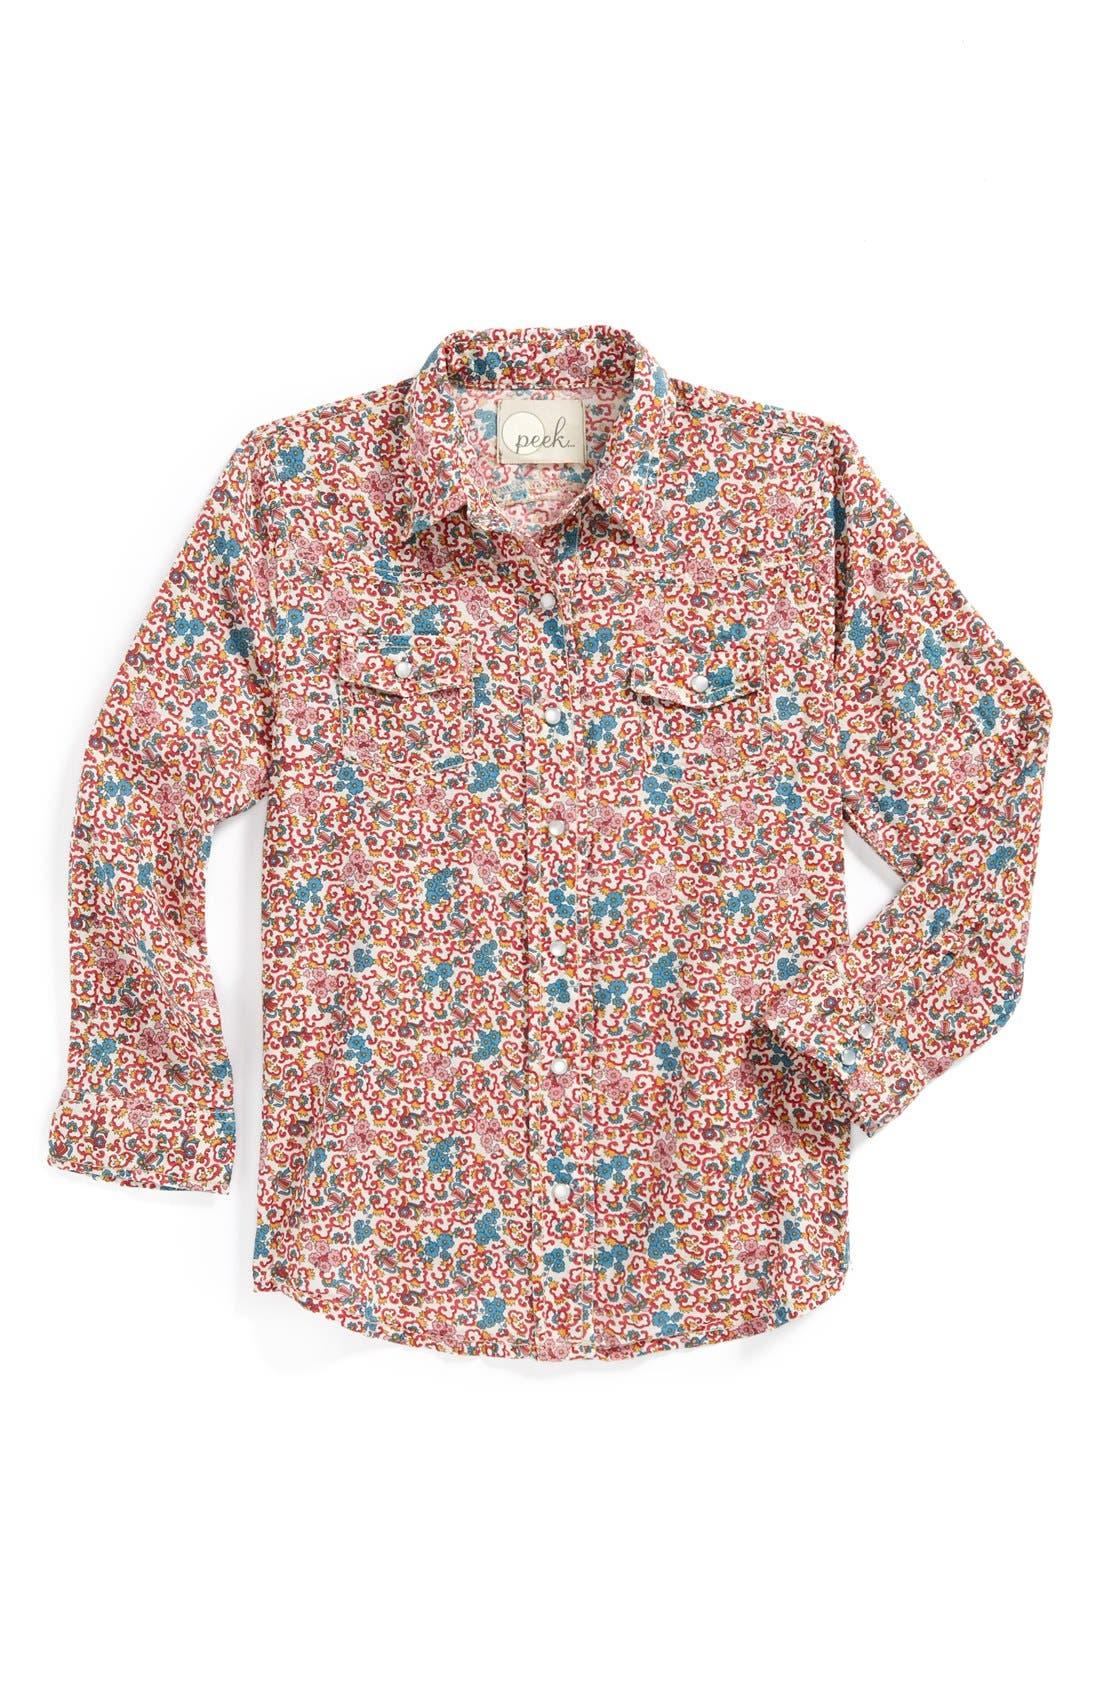 Main Image - Peek Shirt & Jeans (Toddler Girls, Little Girls & Big Girls)